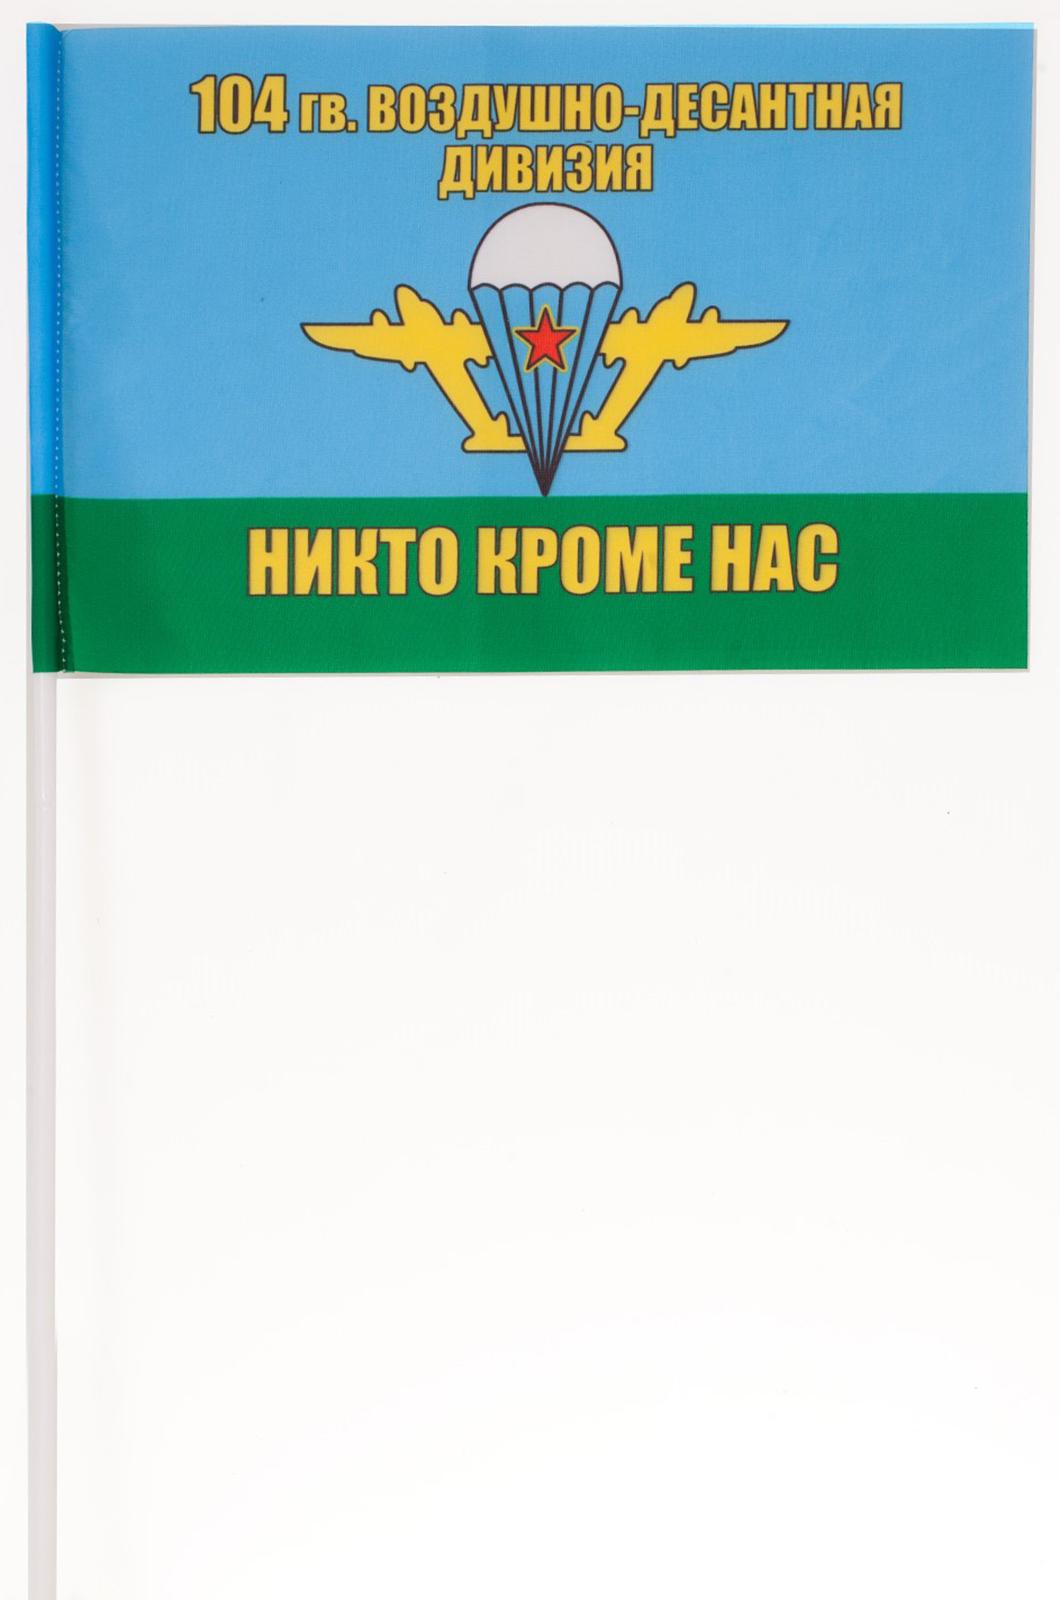 Флажок на палочке «в/ч 73612 ВДВ»